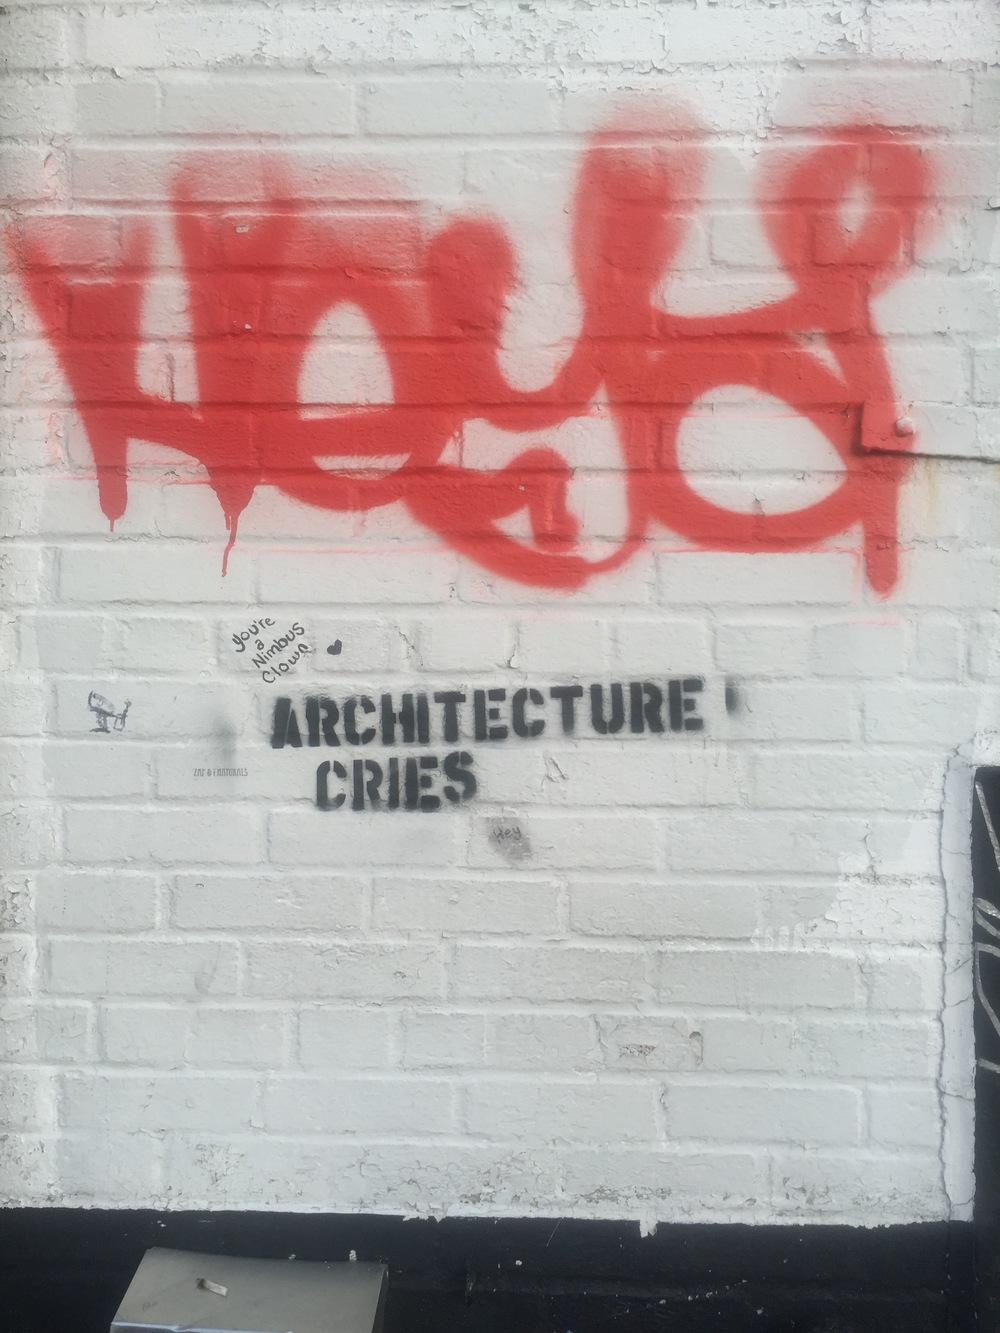 Graffiti in Brooklyn, NY